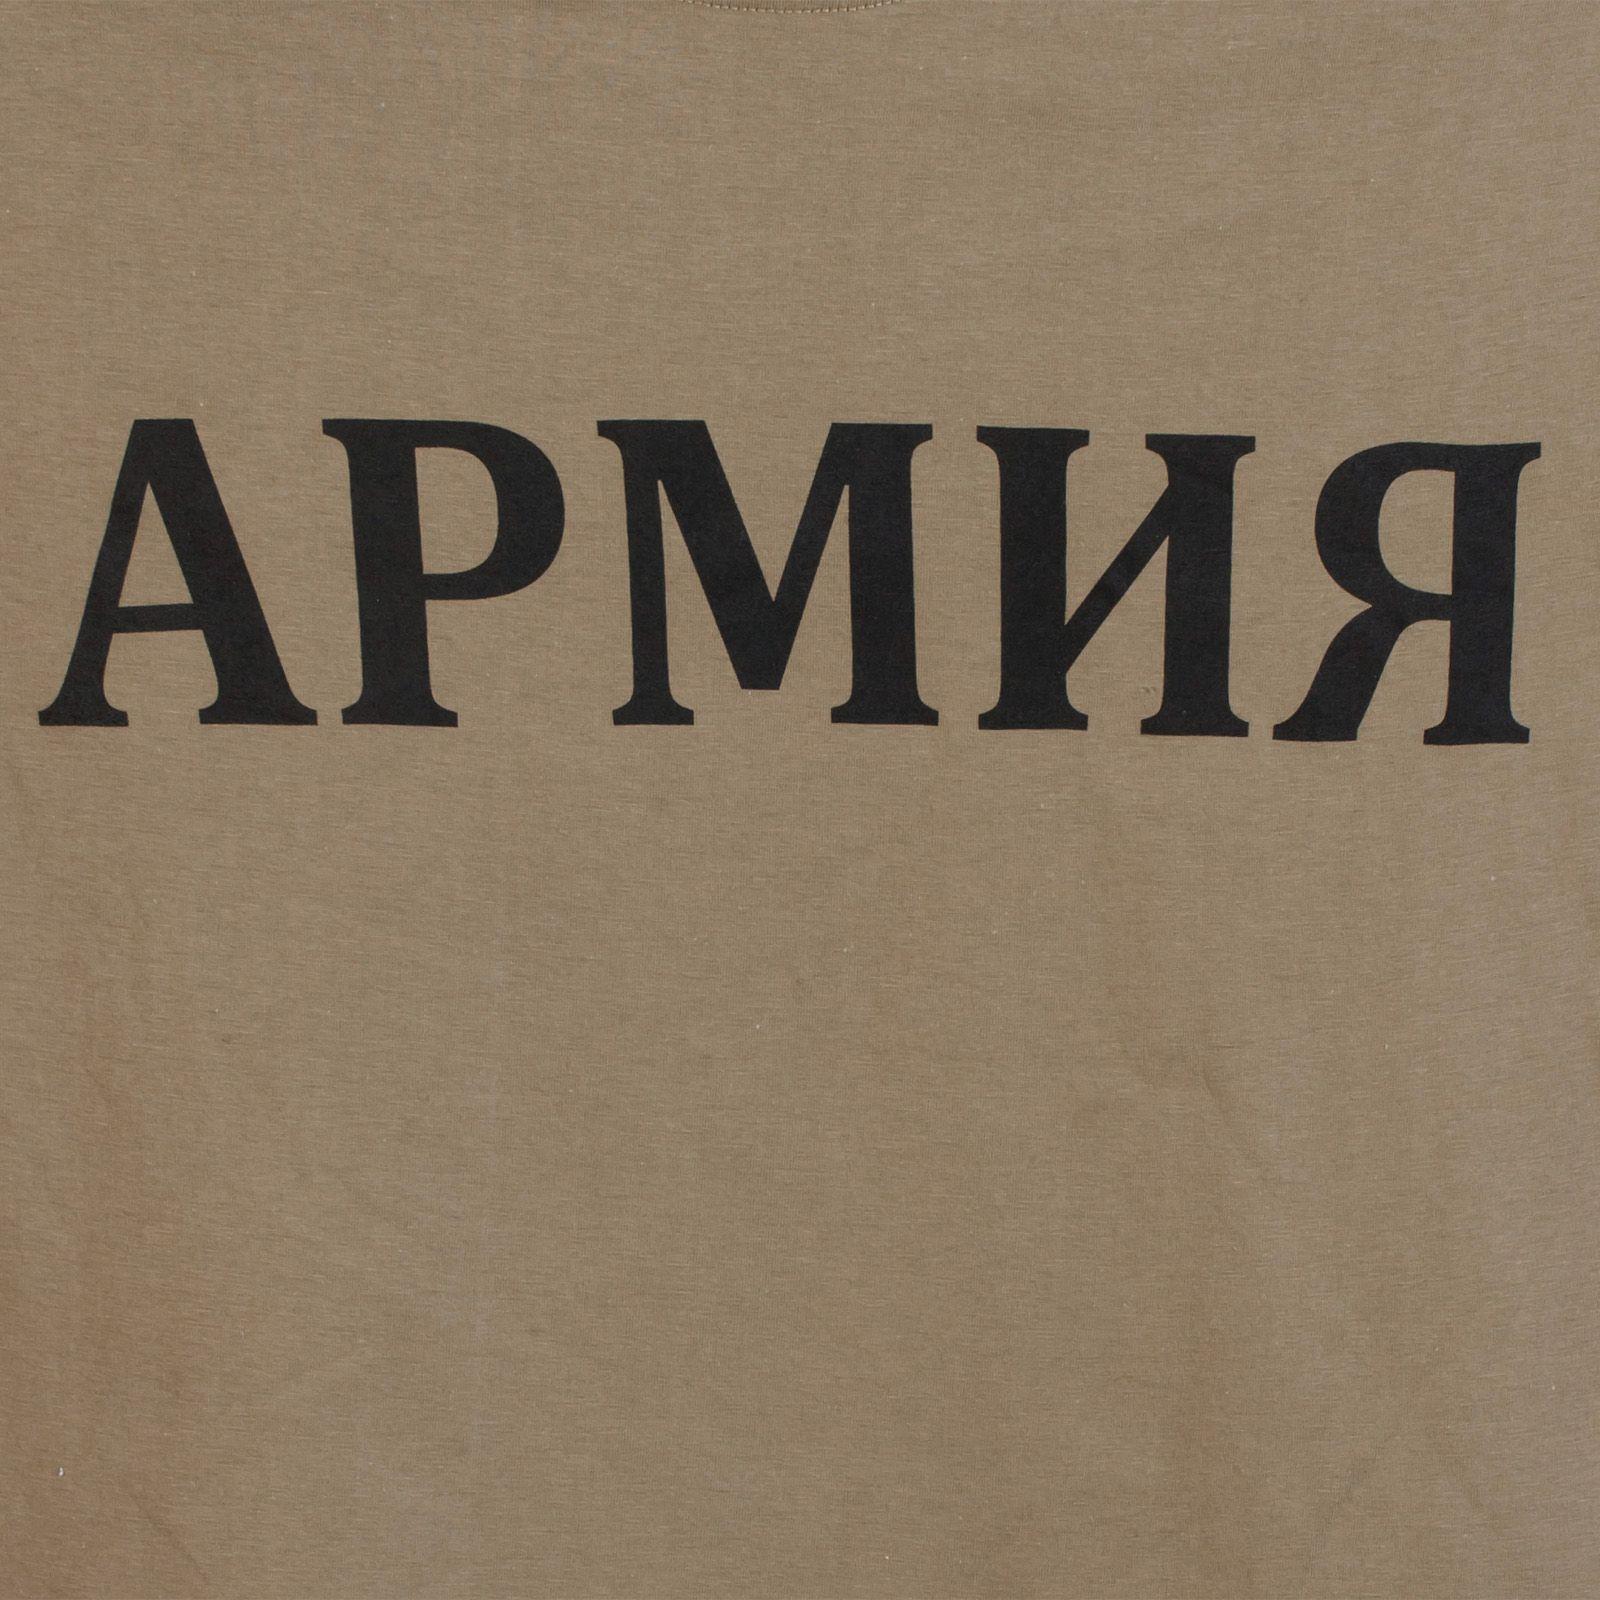 Футболка «Армия» с доставкой